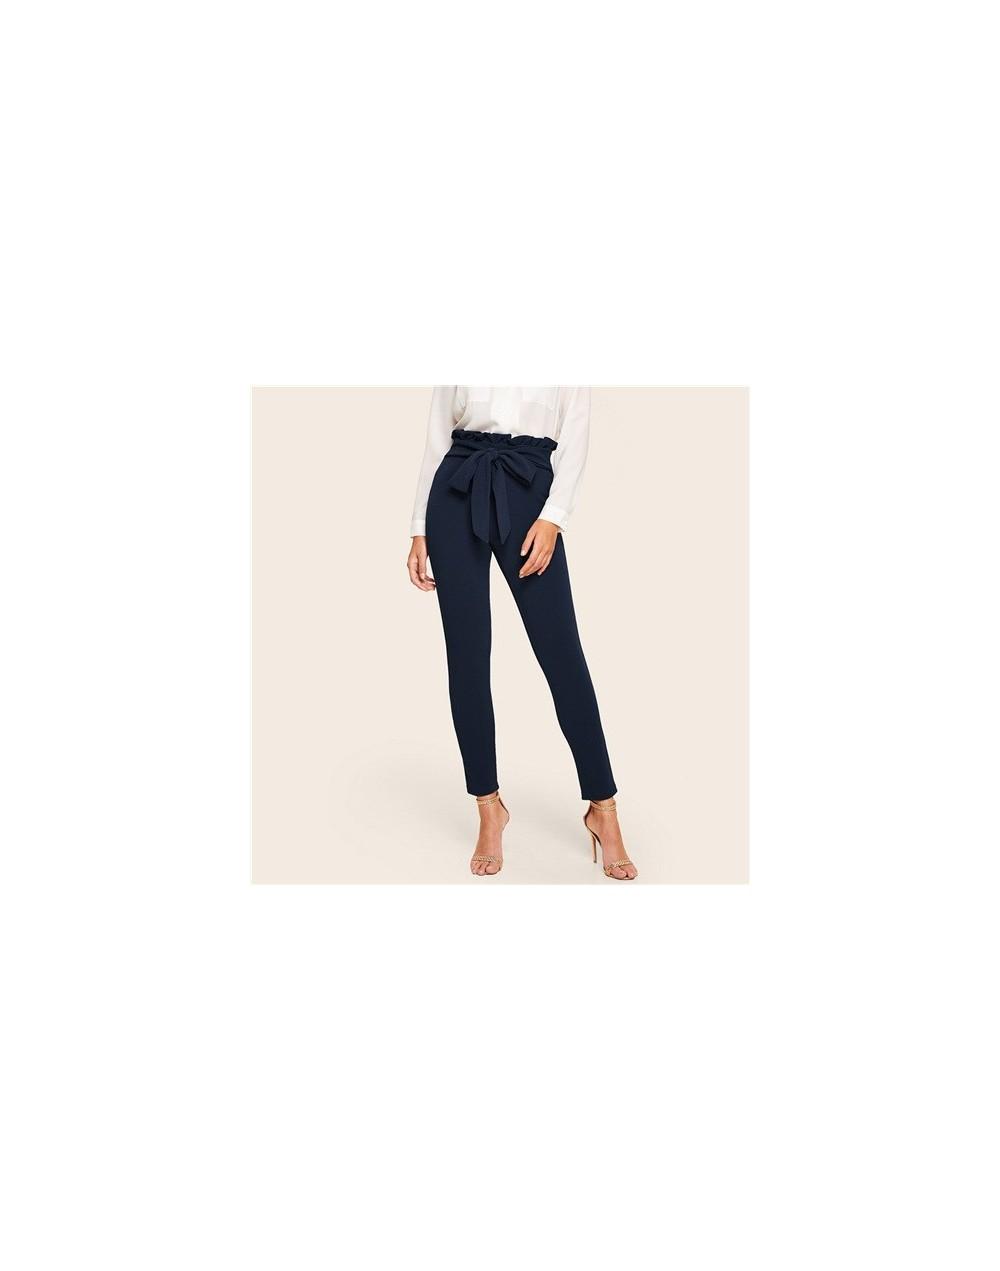 Navy Elegant Trousers Women Paperbag Waist Skinny Pants 2019 Spring Solid OL Work High Waist Womens Pants With Belt - Navy -...